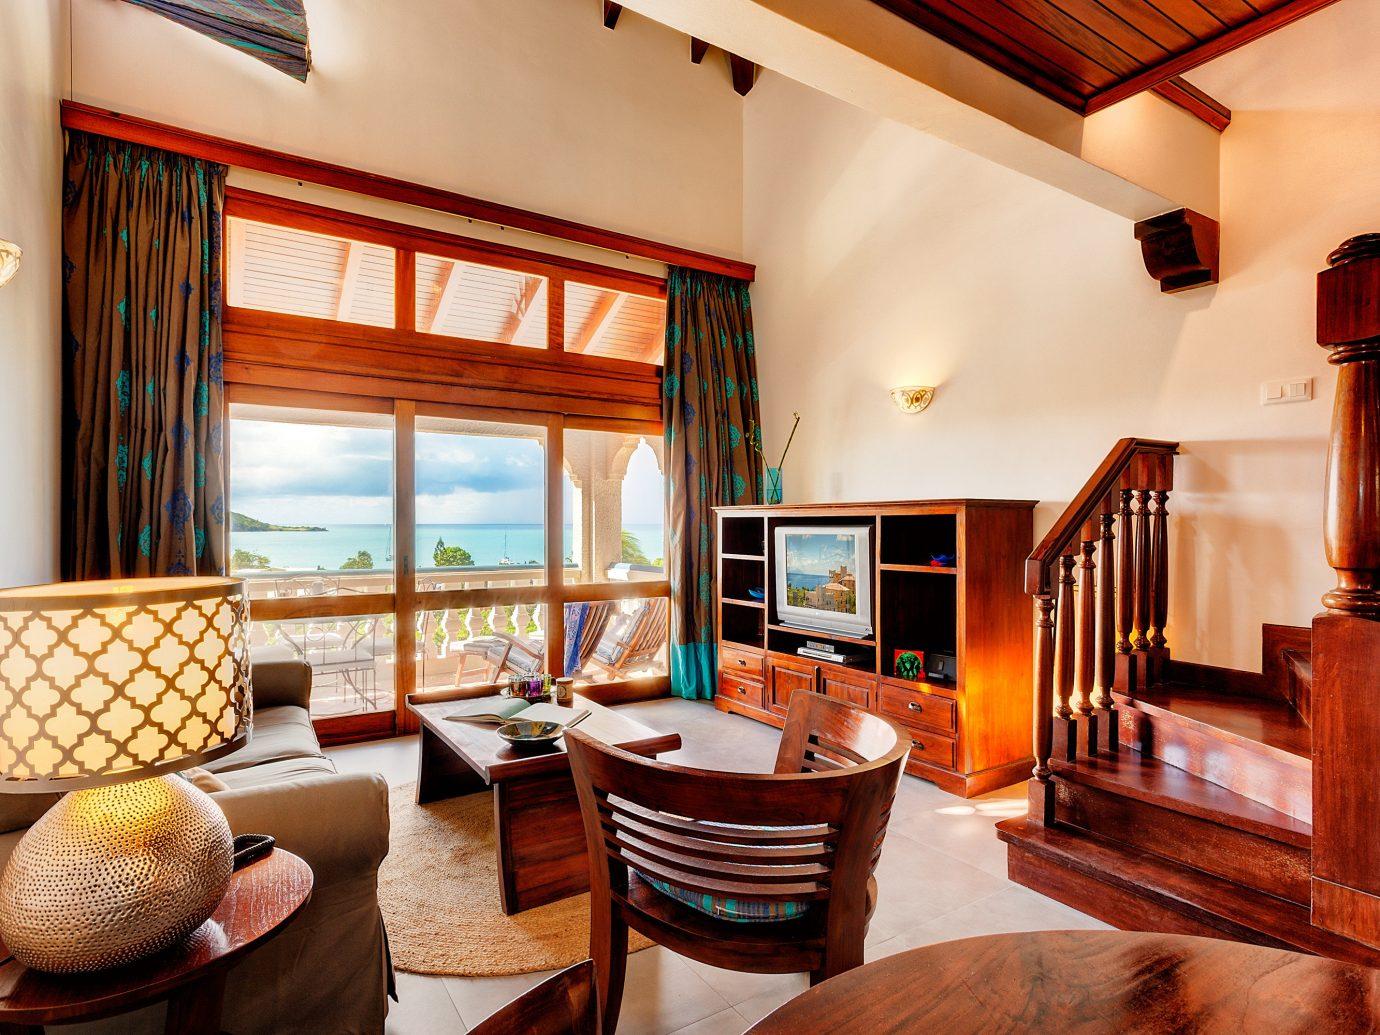 Hotels indoor room Living floor living room chair interior design Suite real estate furniture estate ceiling Dining window area decorated